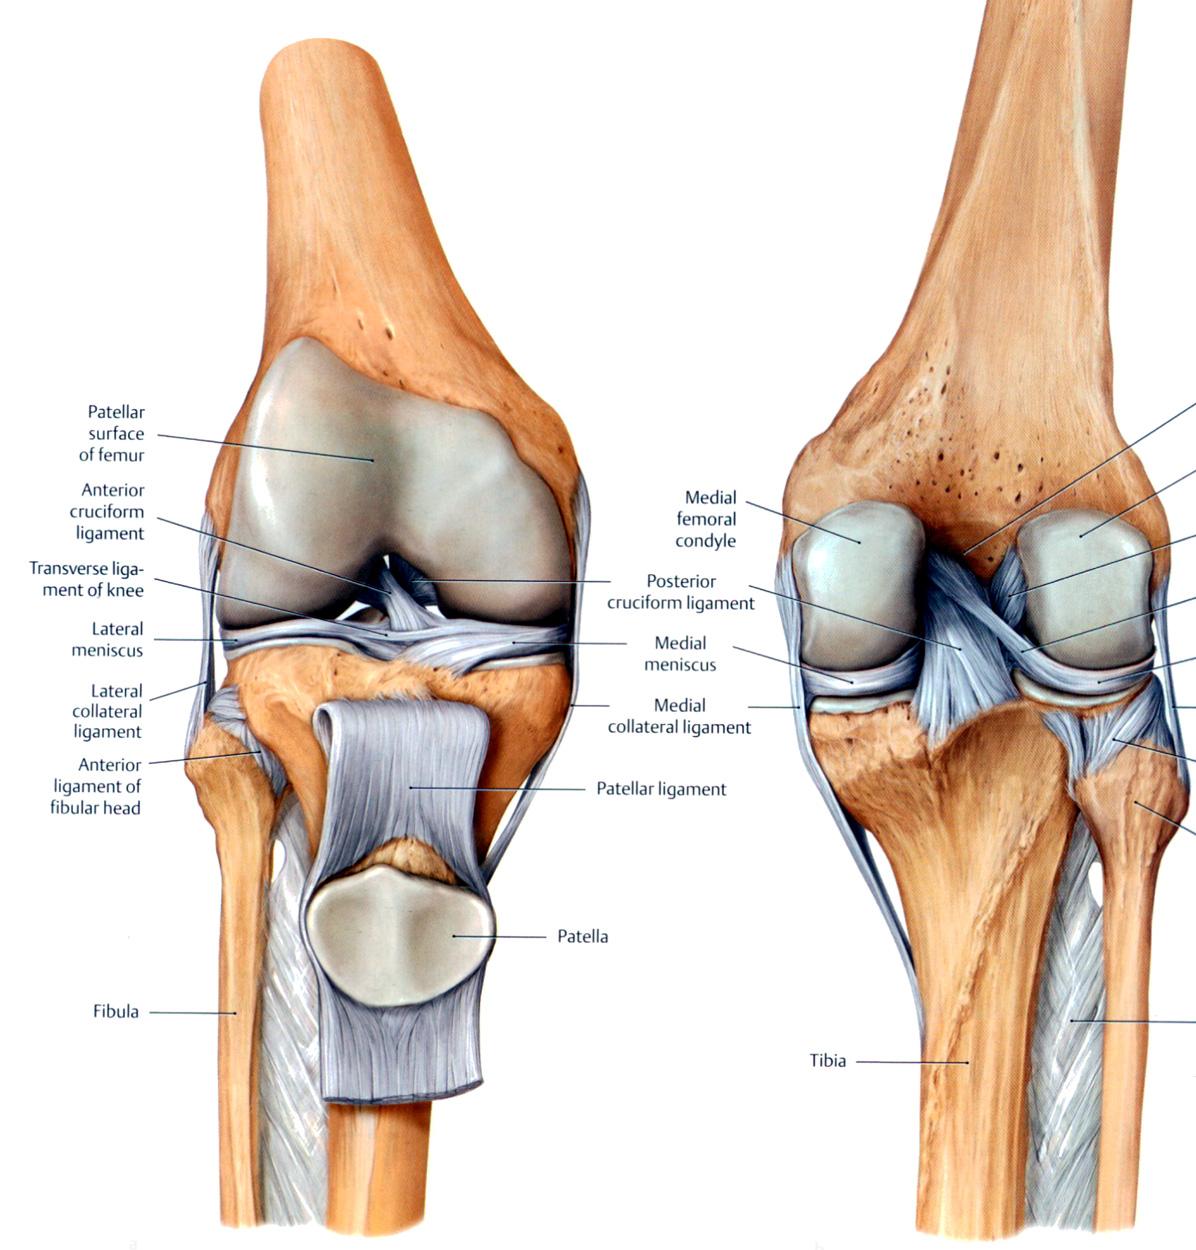 diagram of knee parts